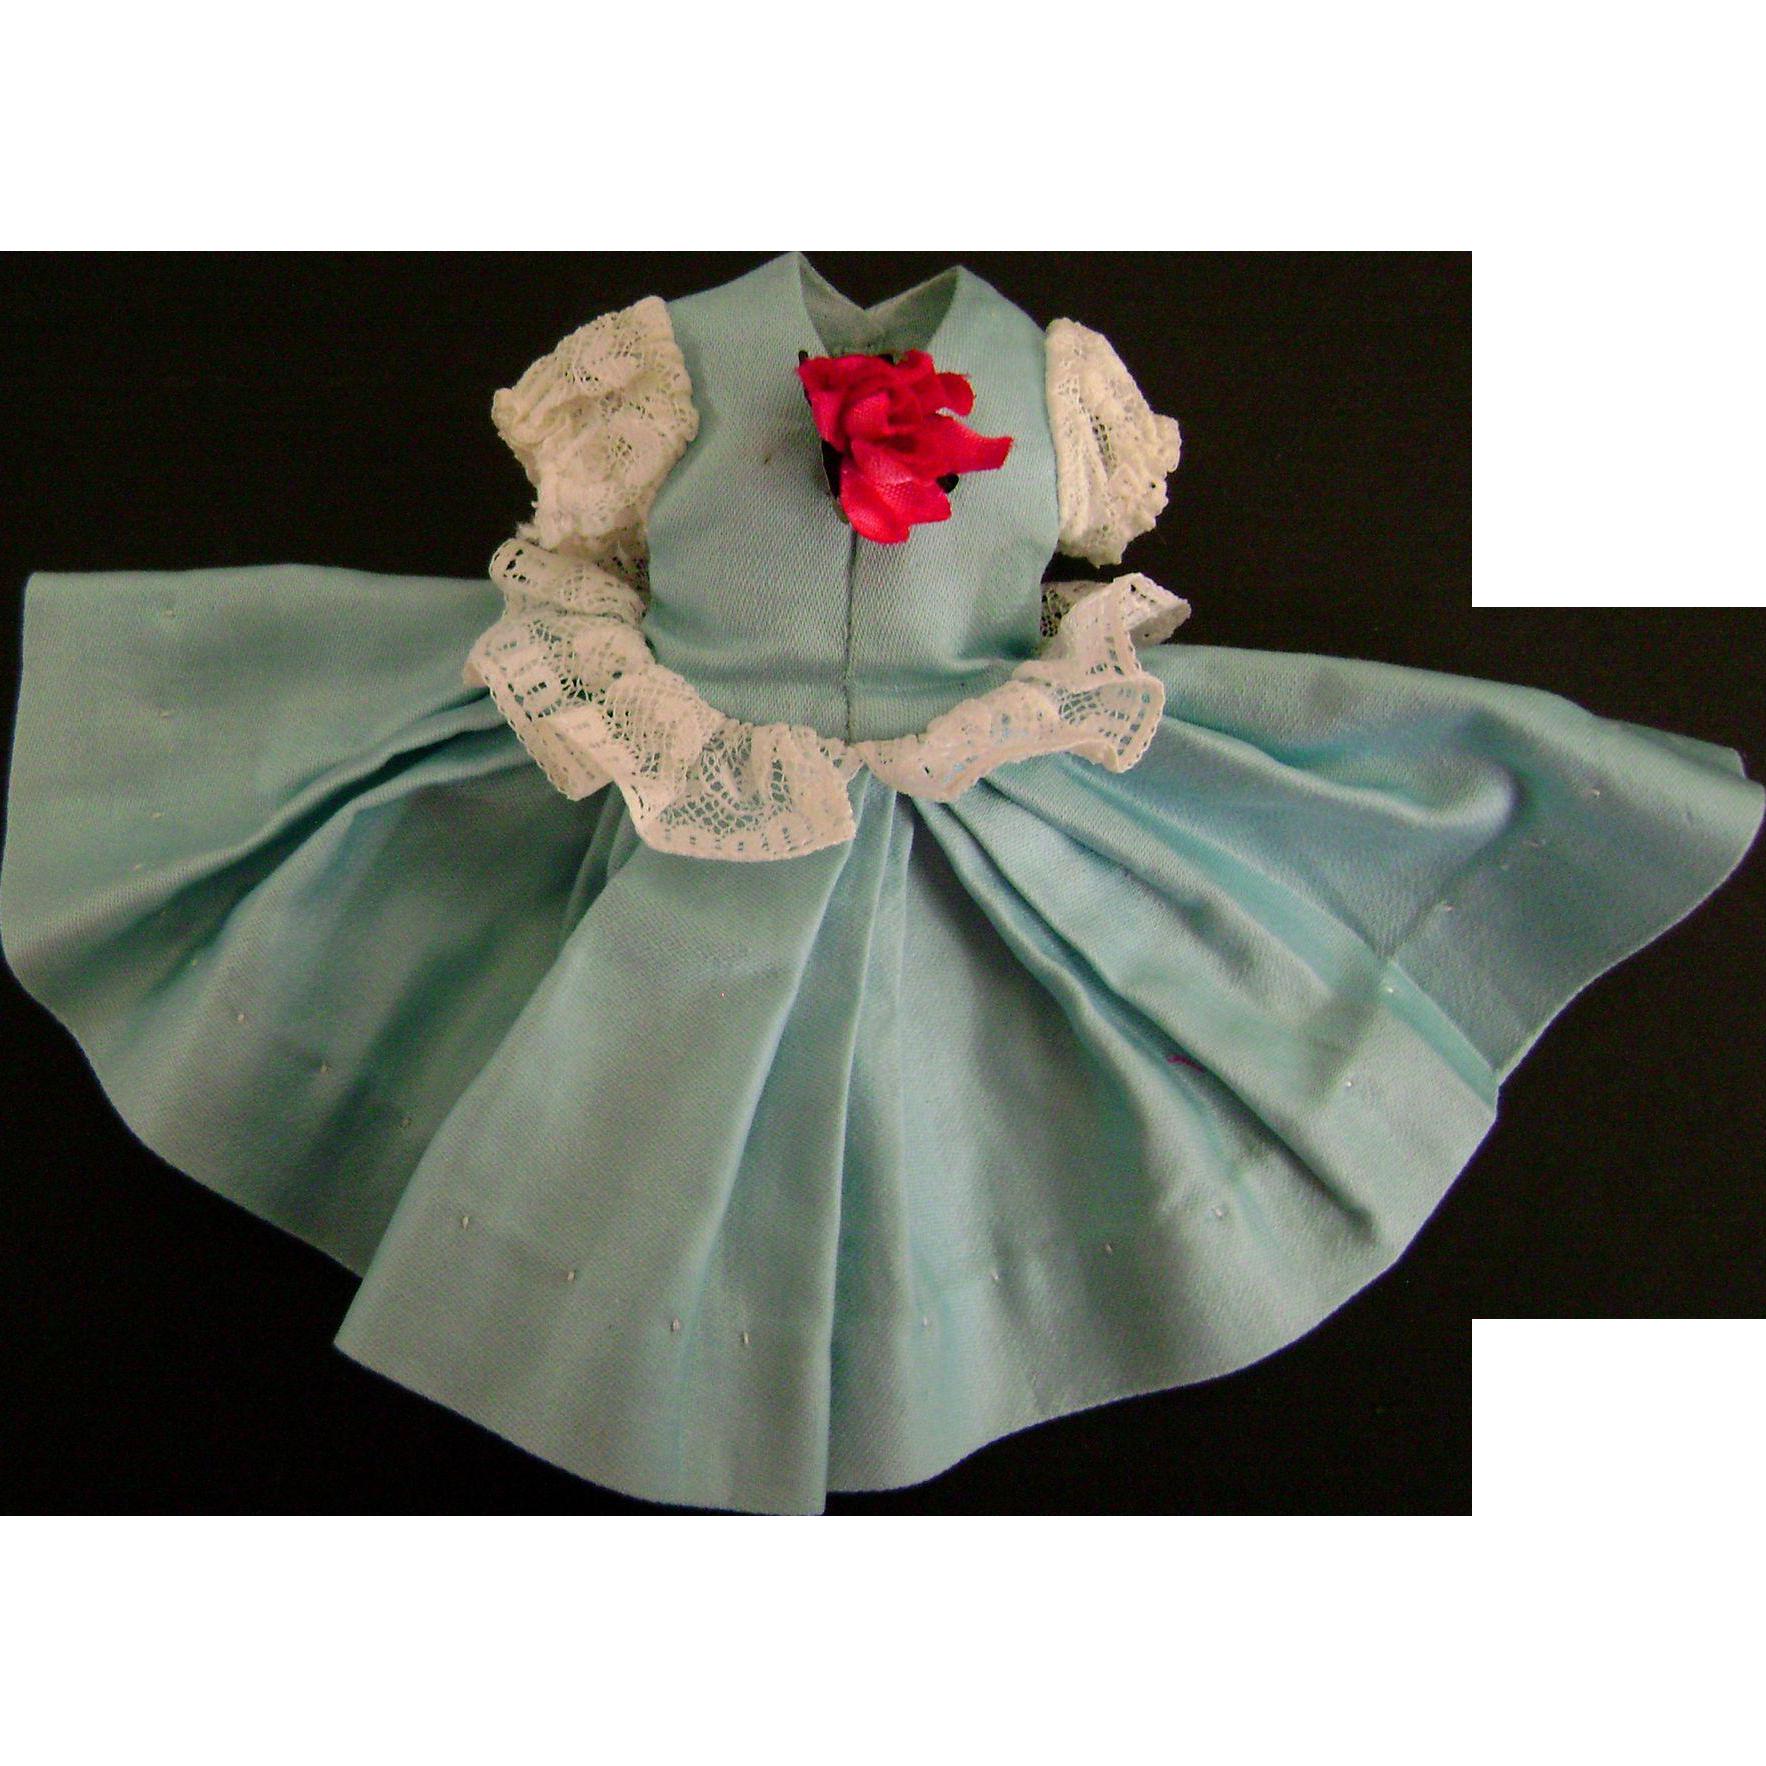 Vintage 1958 Near Mint Madame Alexander Cissette Doll Clothes RARE Tagged Dress